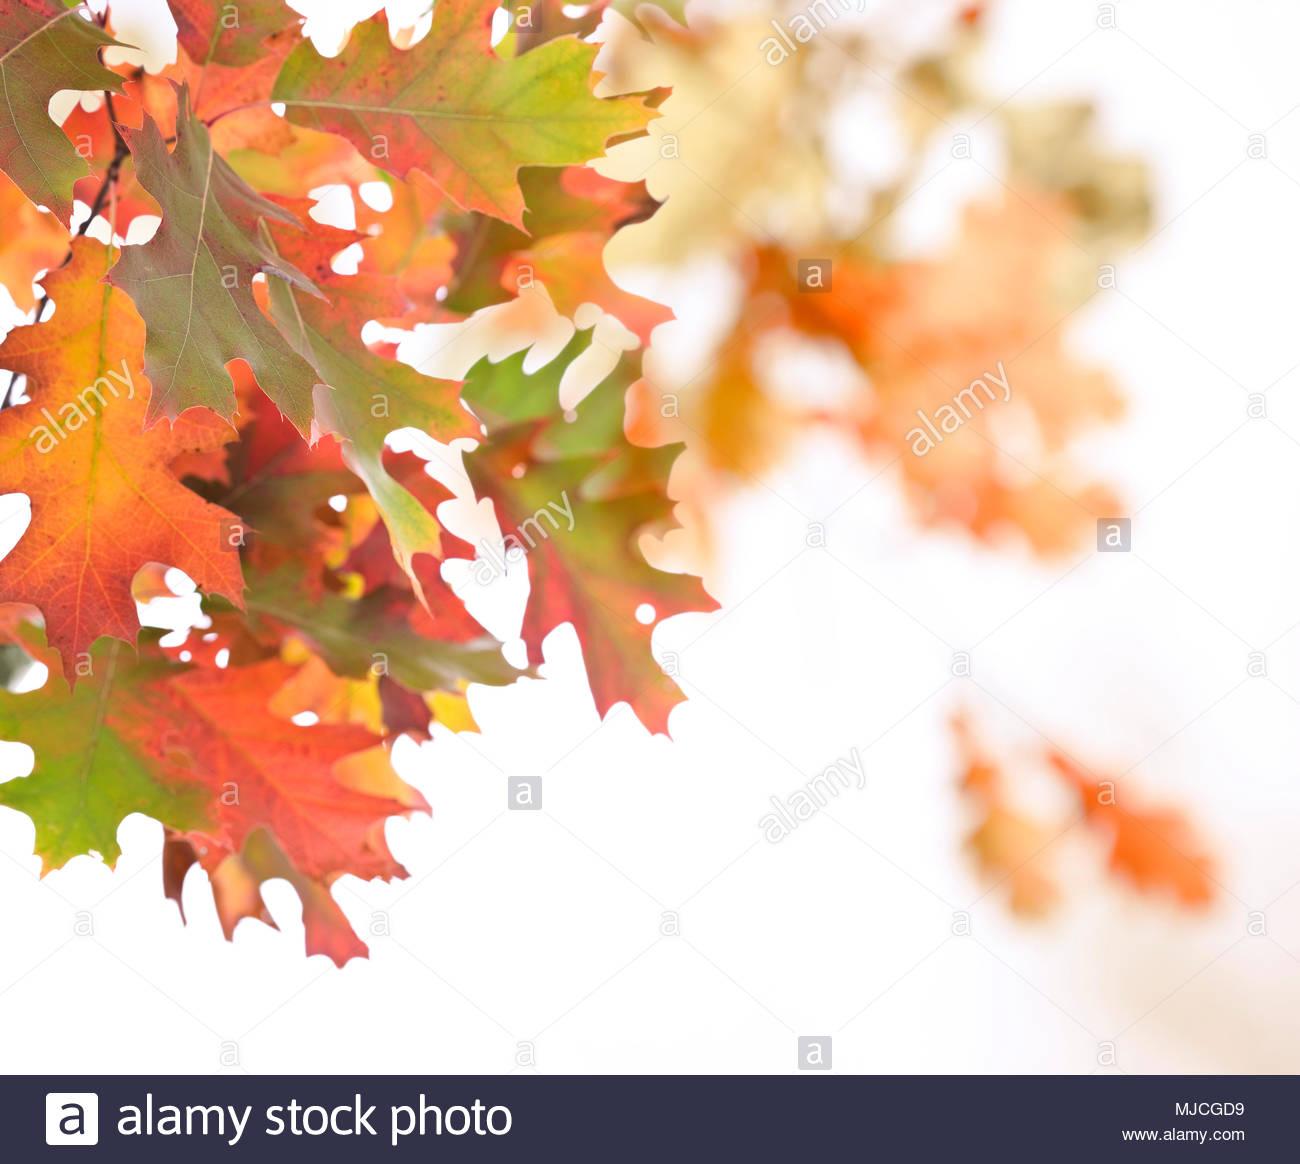 Oak Frame Stockfotos & Oak Frame Bilder - Seite 2 - Alamy